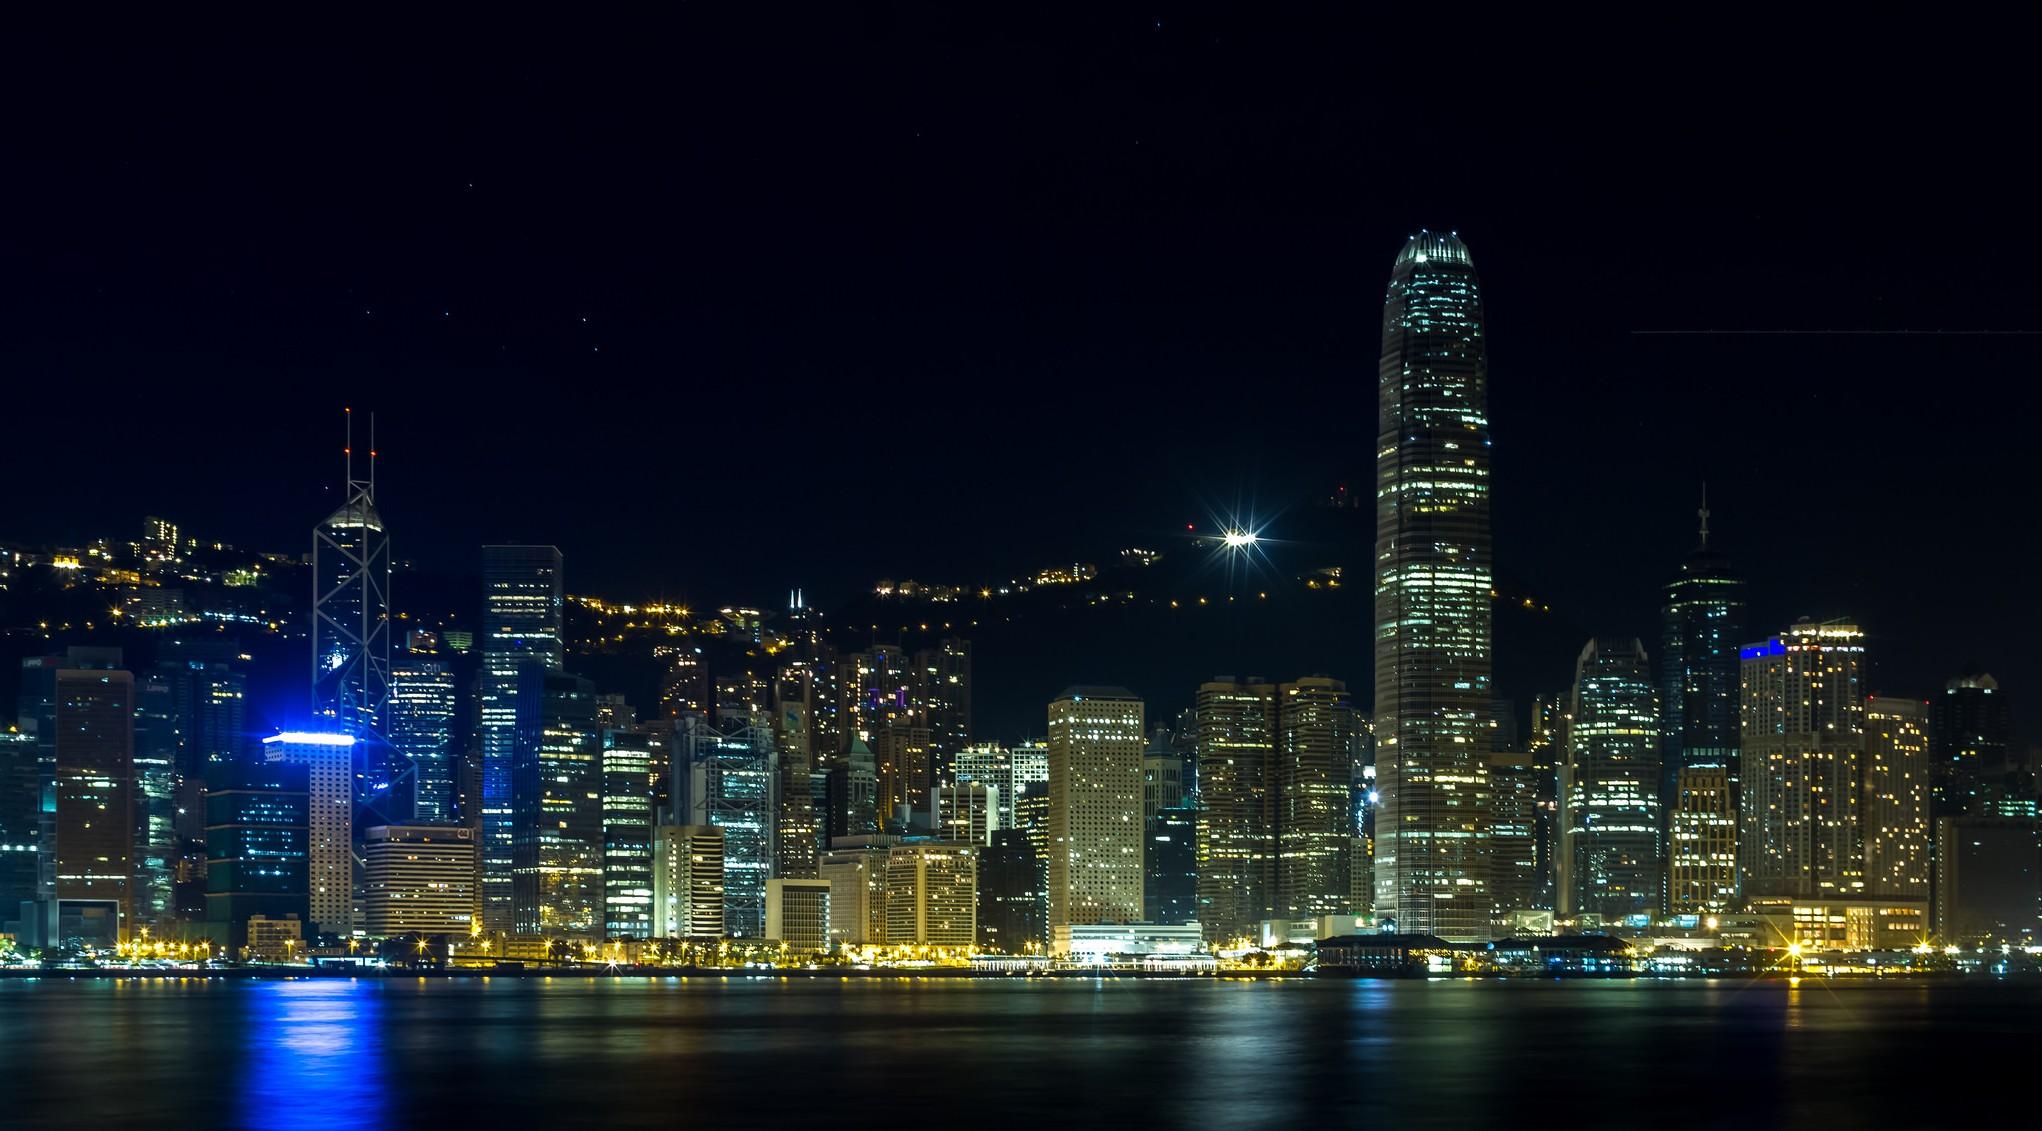 gode dating steder i Hong Kong gratis live online dating nettsted